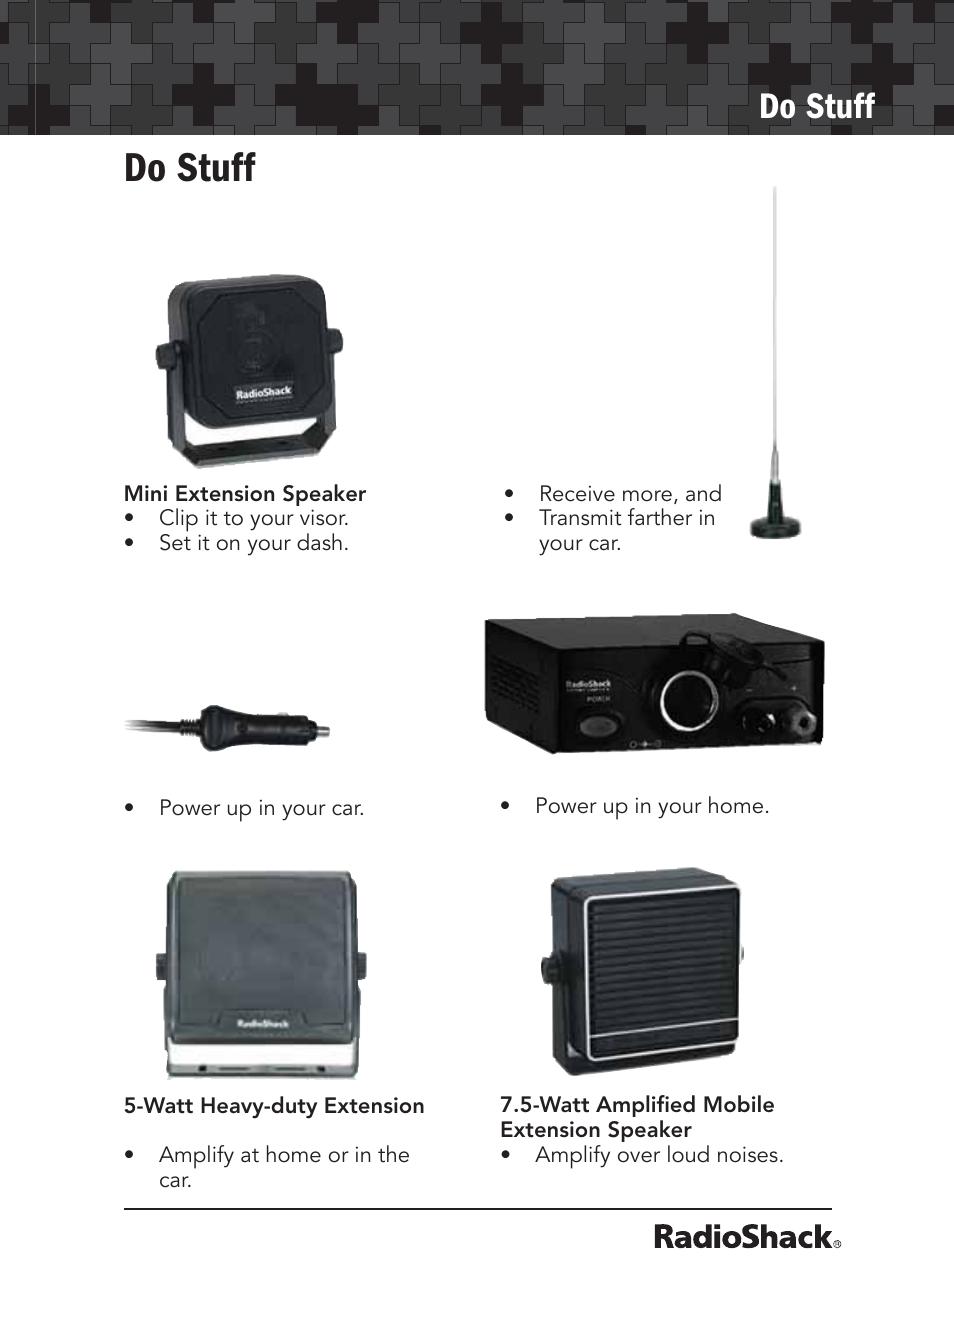 do stuff radio shack 21 1679 user manual page 19 20 rh manualsdir com Radio Shack Closing Radio Shack Products